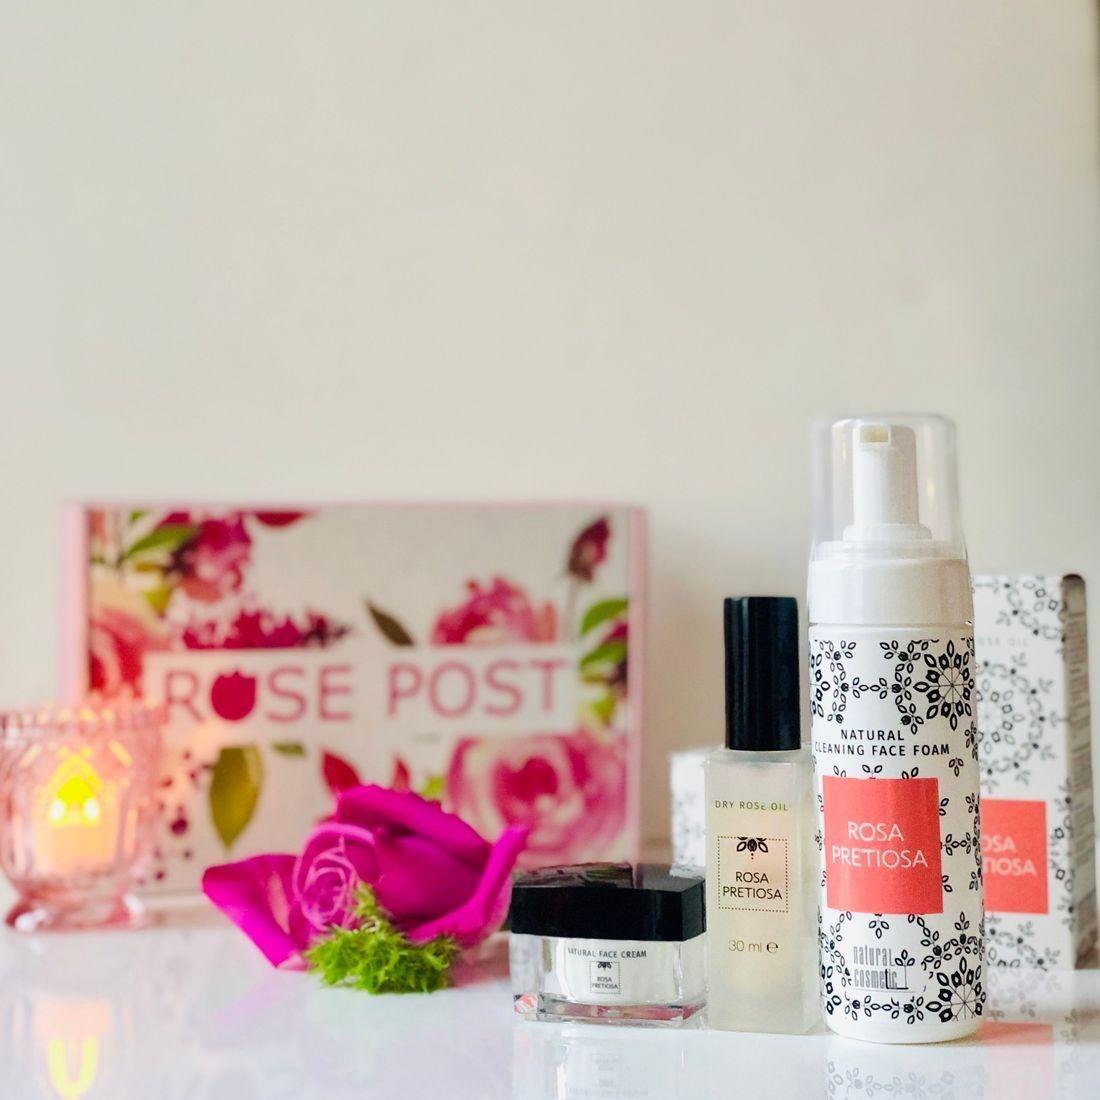 Rose Gift Box, Rosa Pretiosa, Holiday Gift Box,RosePost Spring Box, RosePost Box, Green Beauty Subscription, Rose Beauty Box, Green Beauty Box, Rose Skincare, Clean Rose Beauty